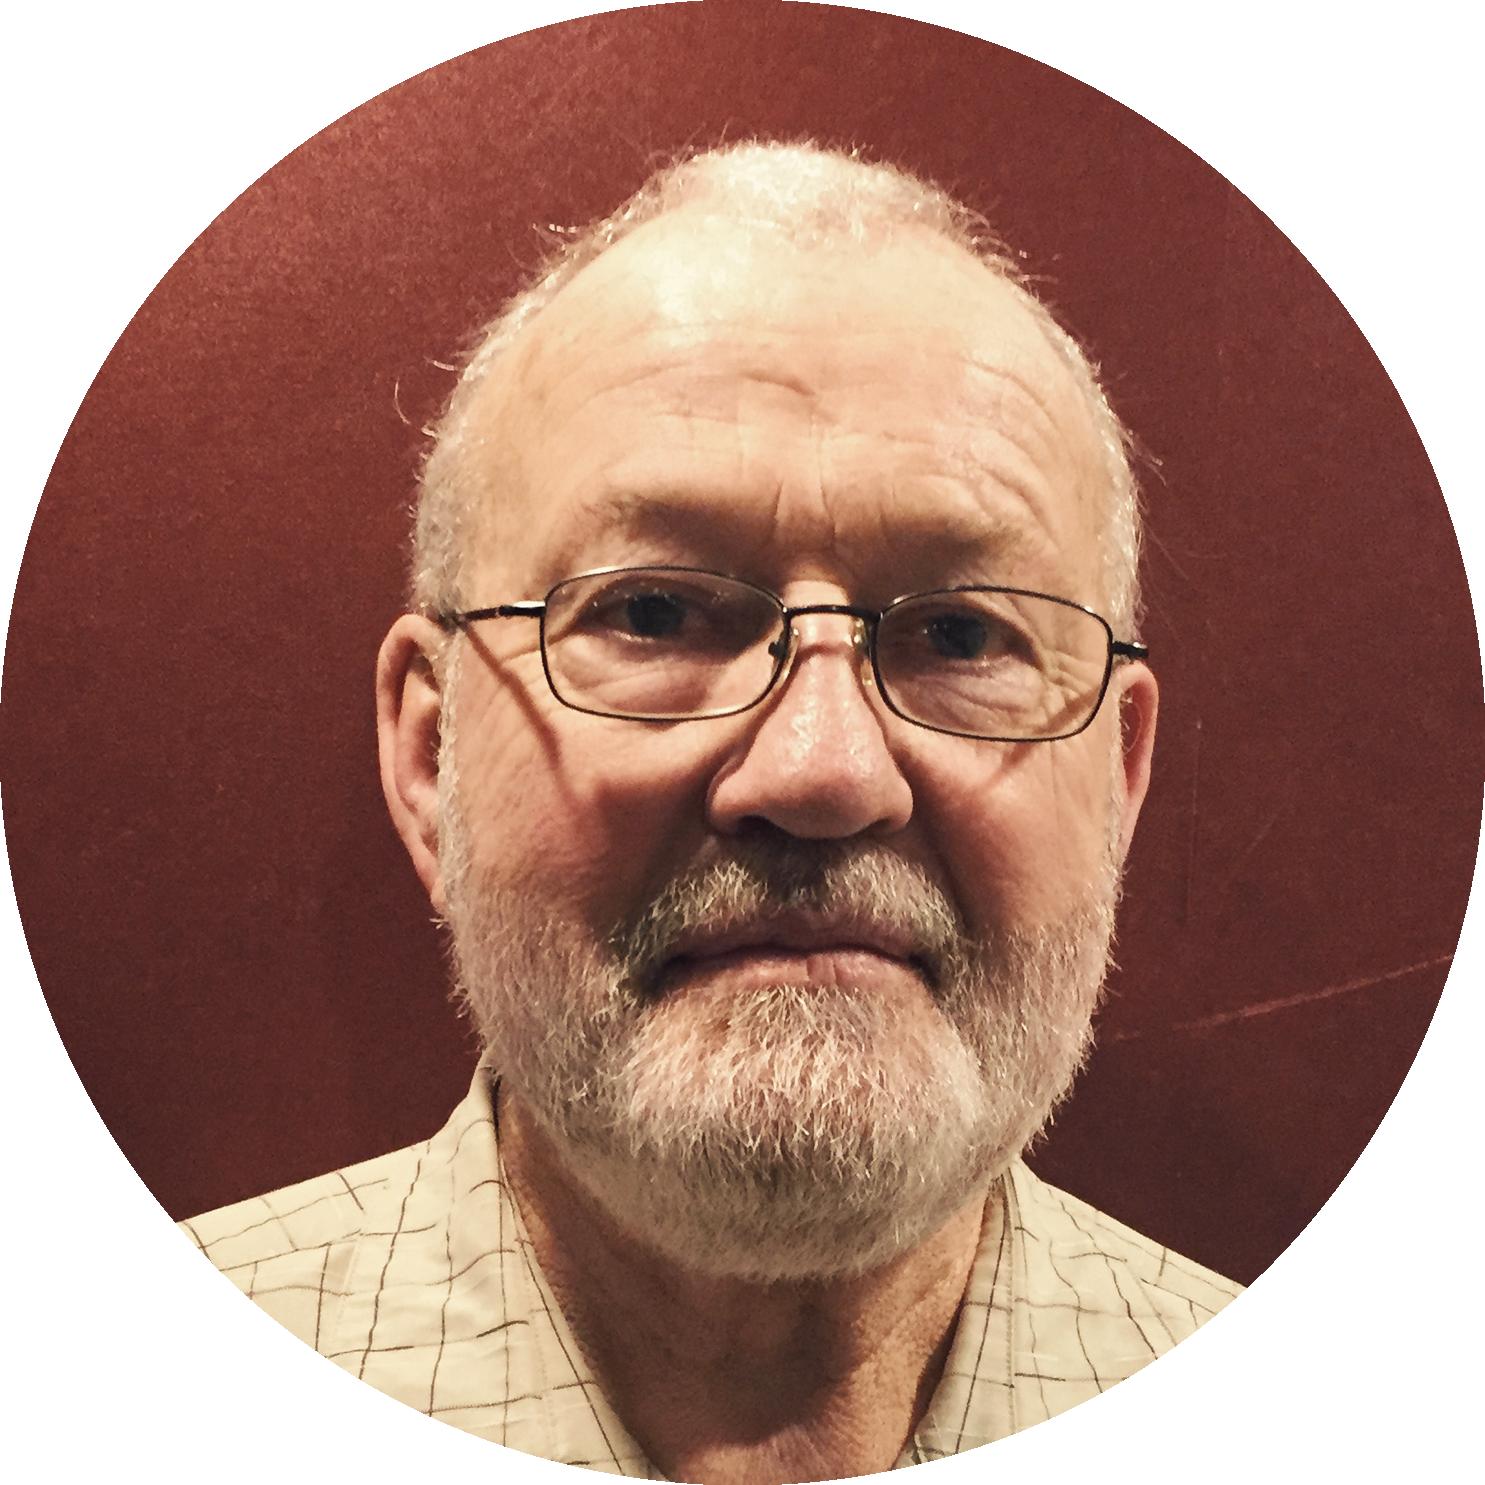 Steve_Worden_Profile.png